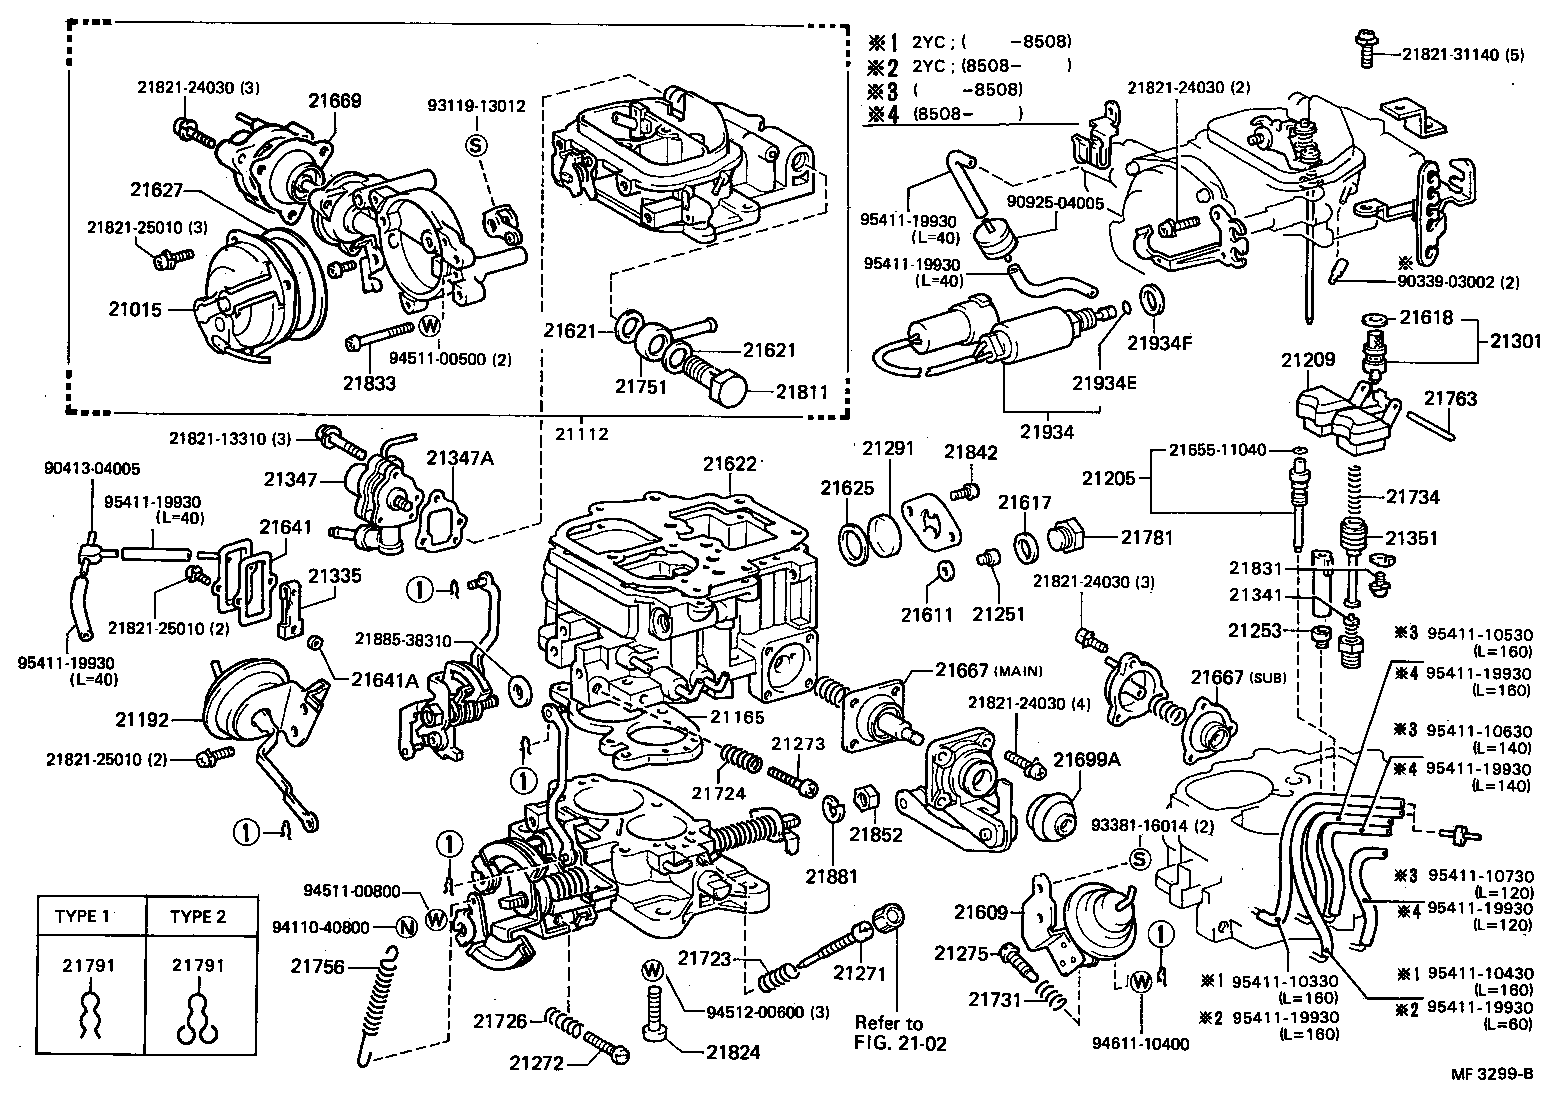 toyota liteaceym21rv-mrgq - tool-engine-fuel